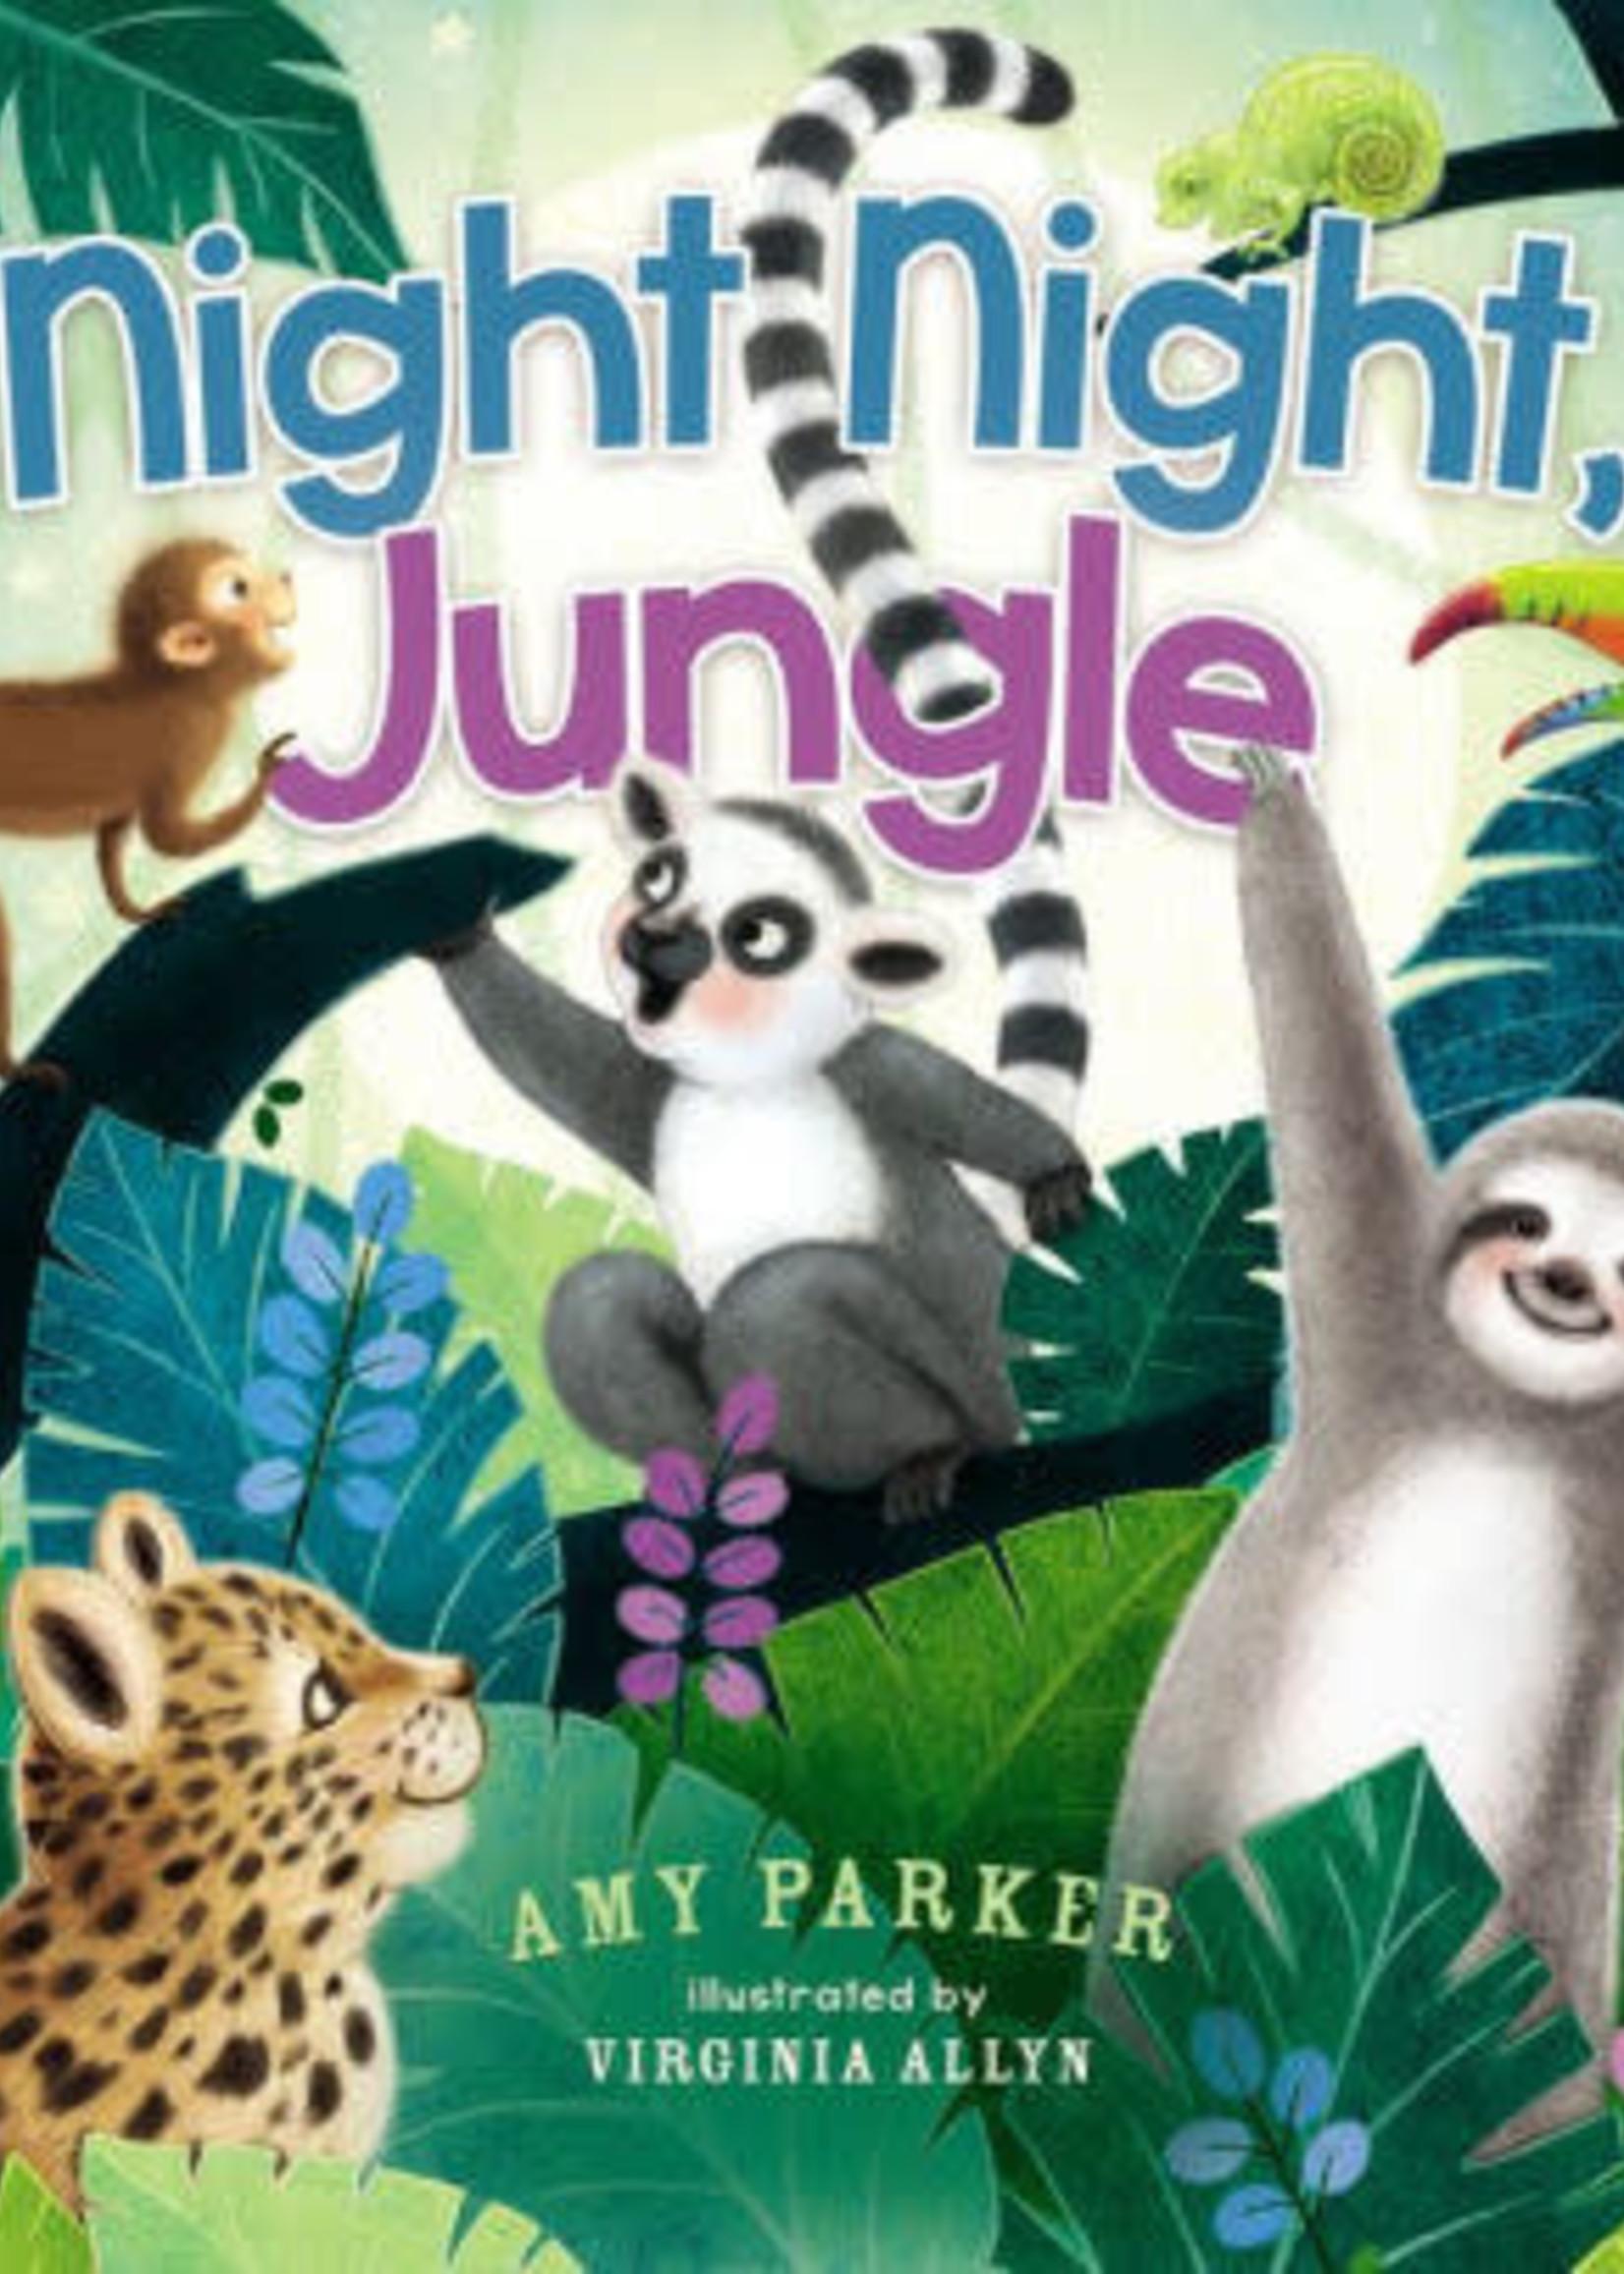 Night Night Jungle